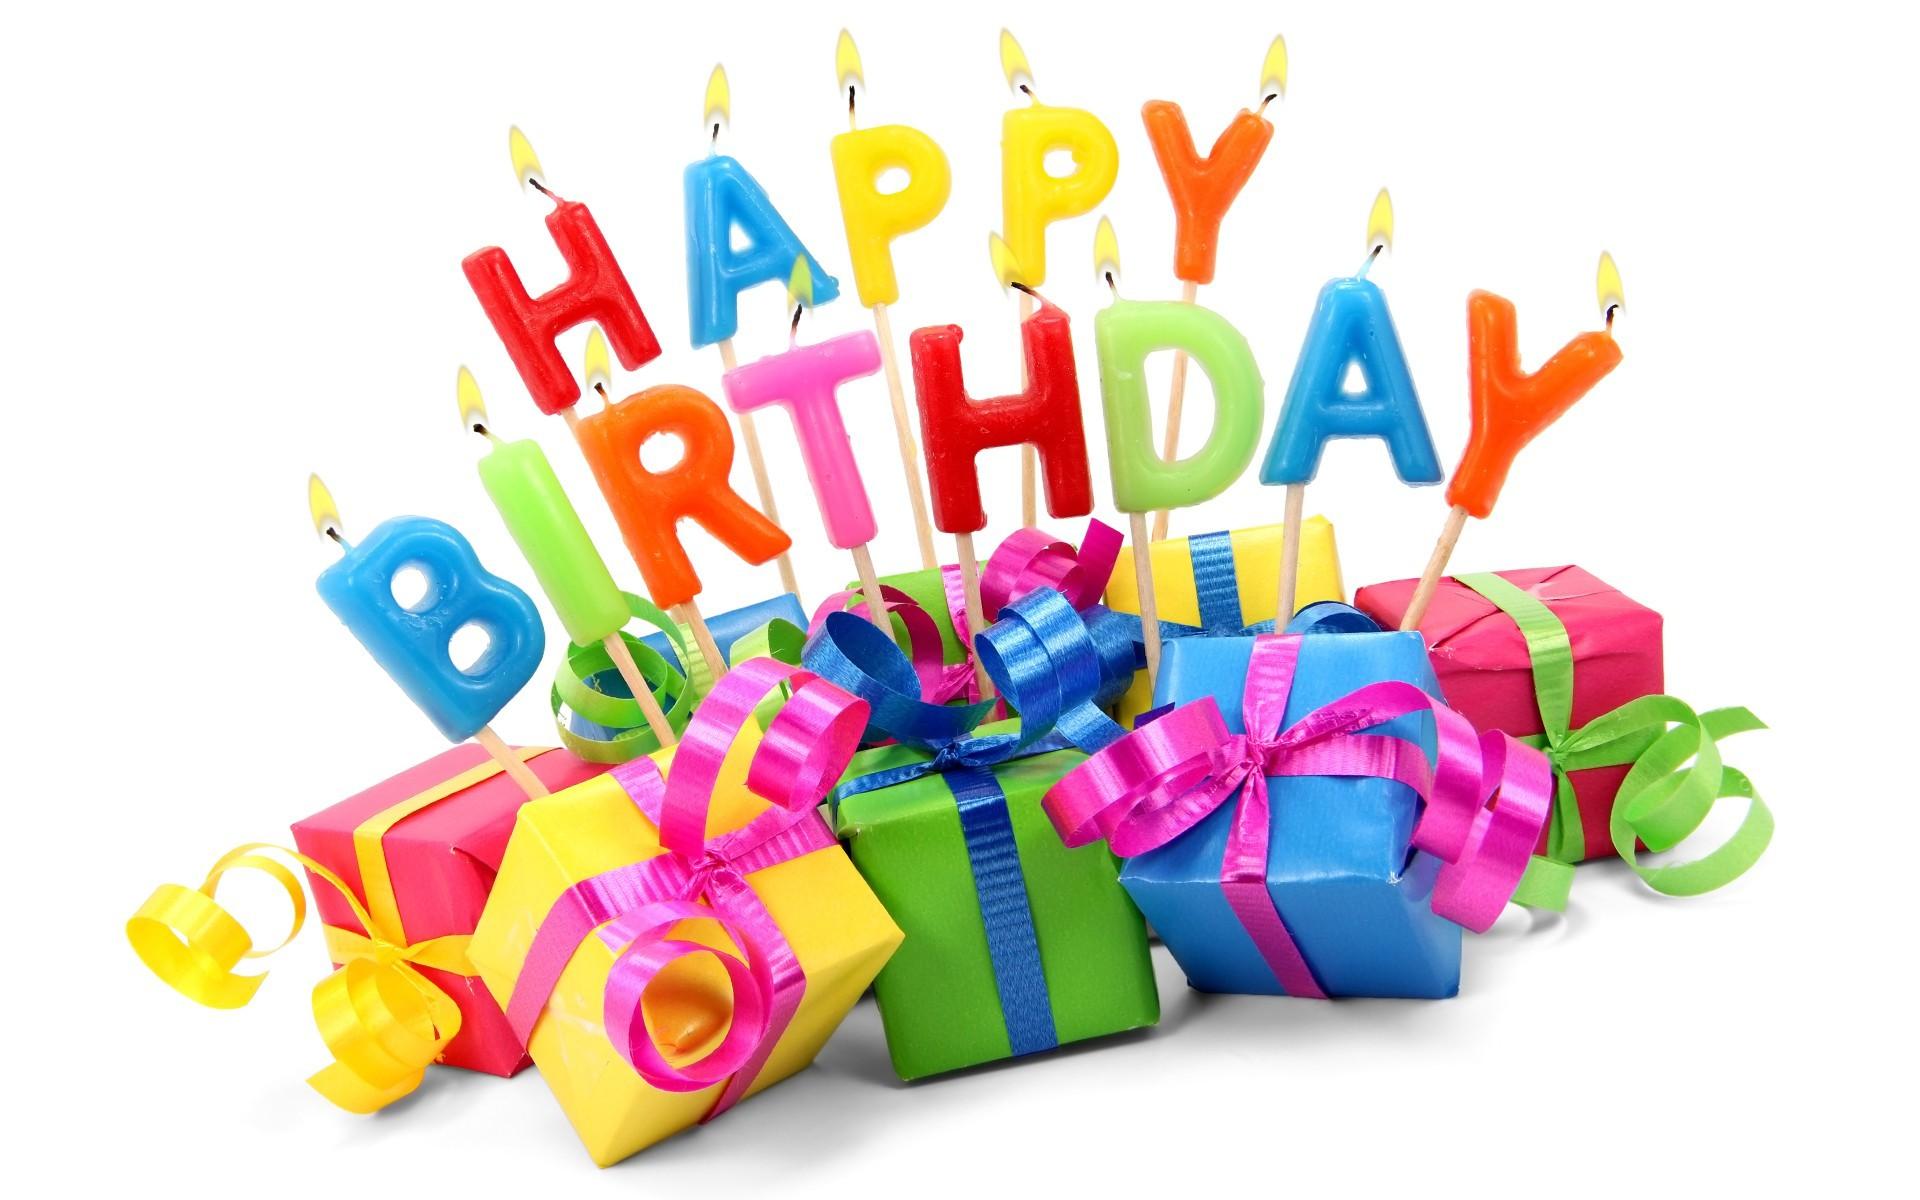 Happy Birthday Desktop Wallpaper 183 ① Wallpapertag